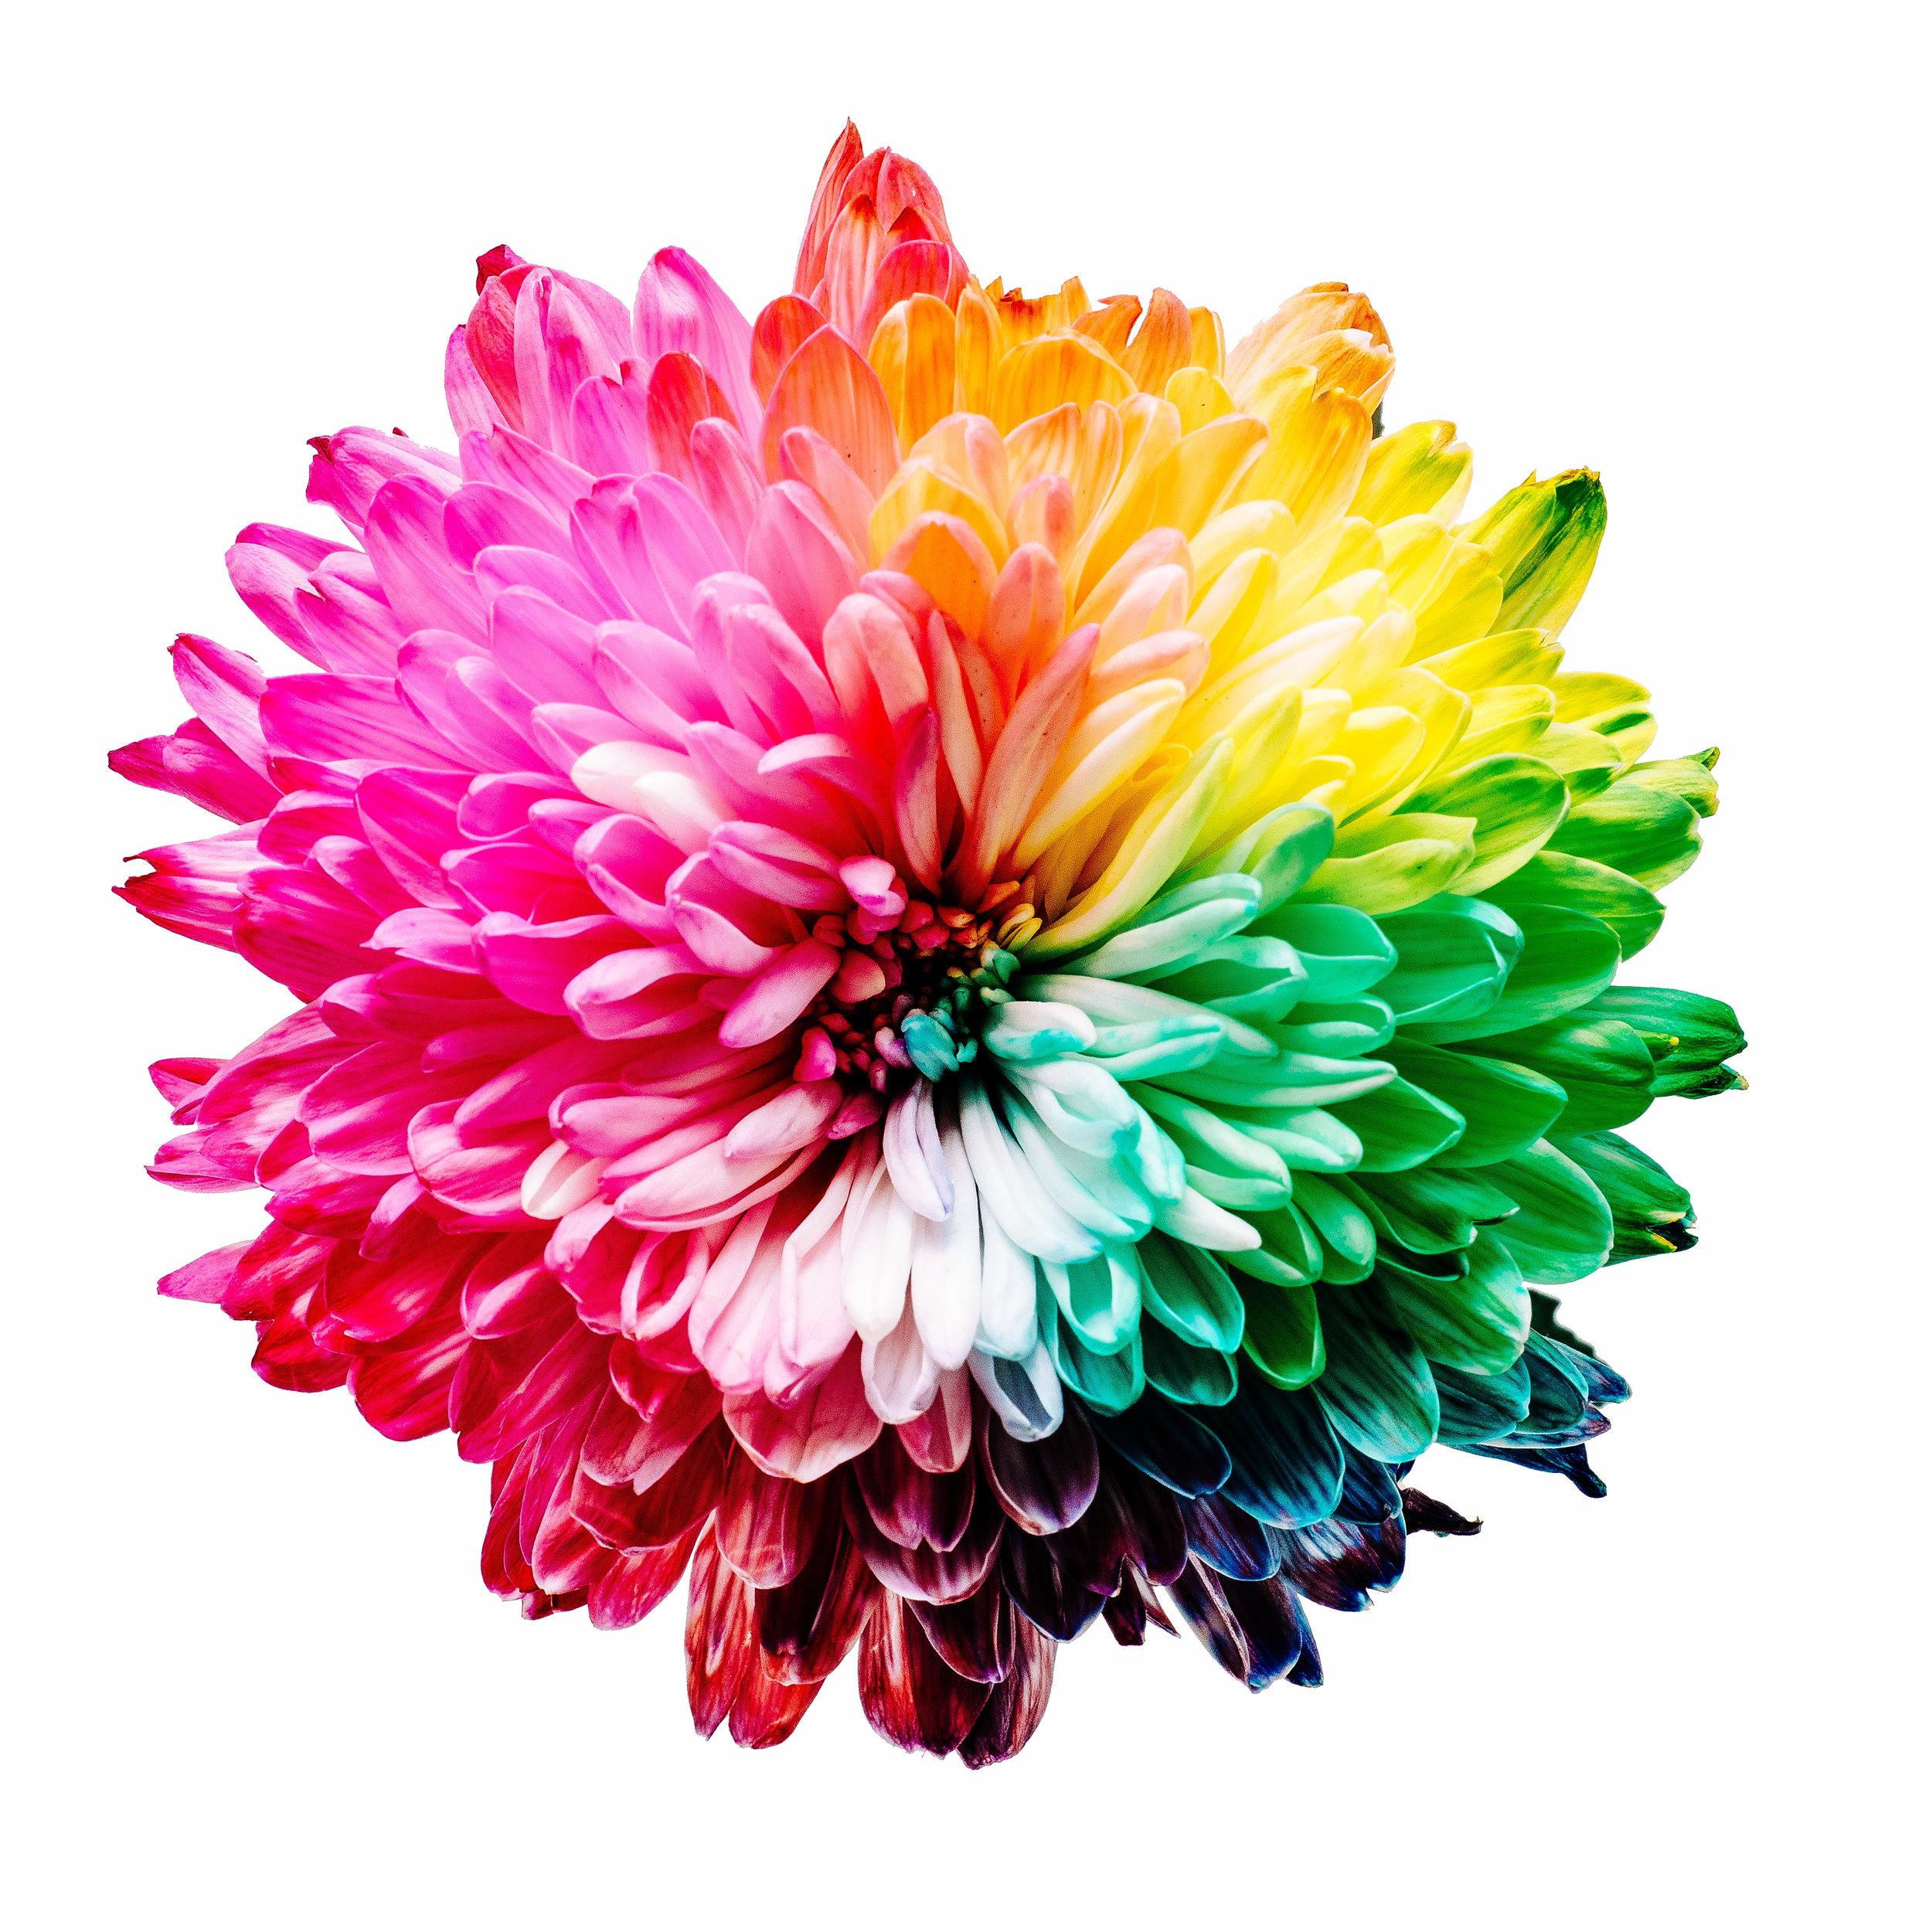 Image - multicoloured flower